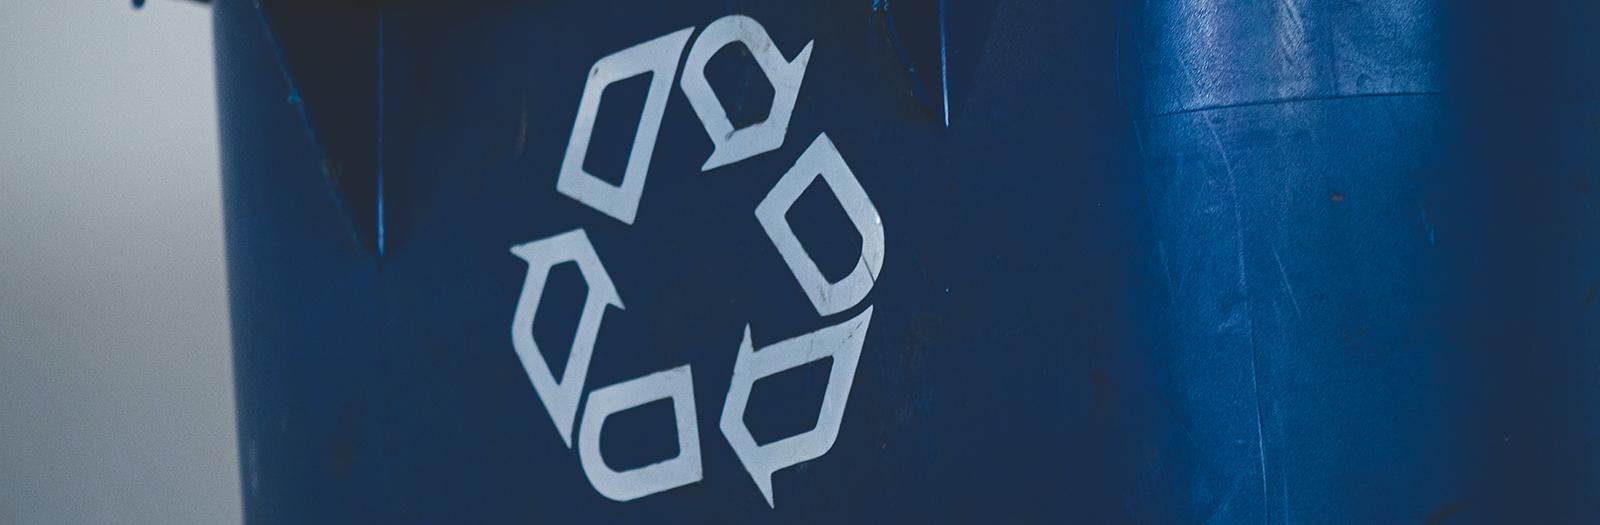 recycle symbol on blue bin